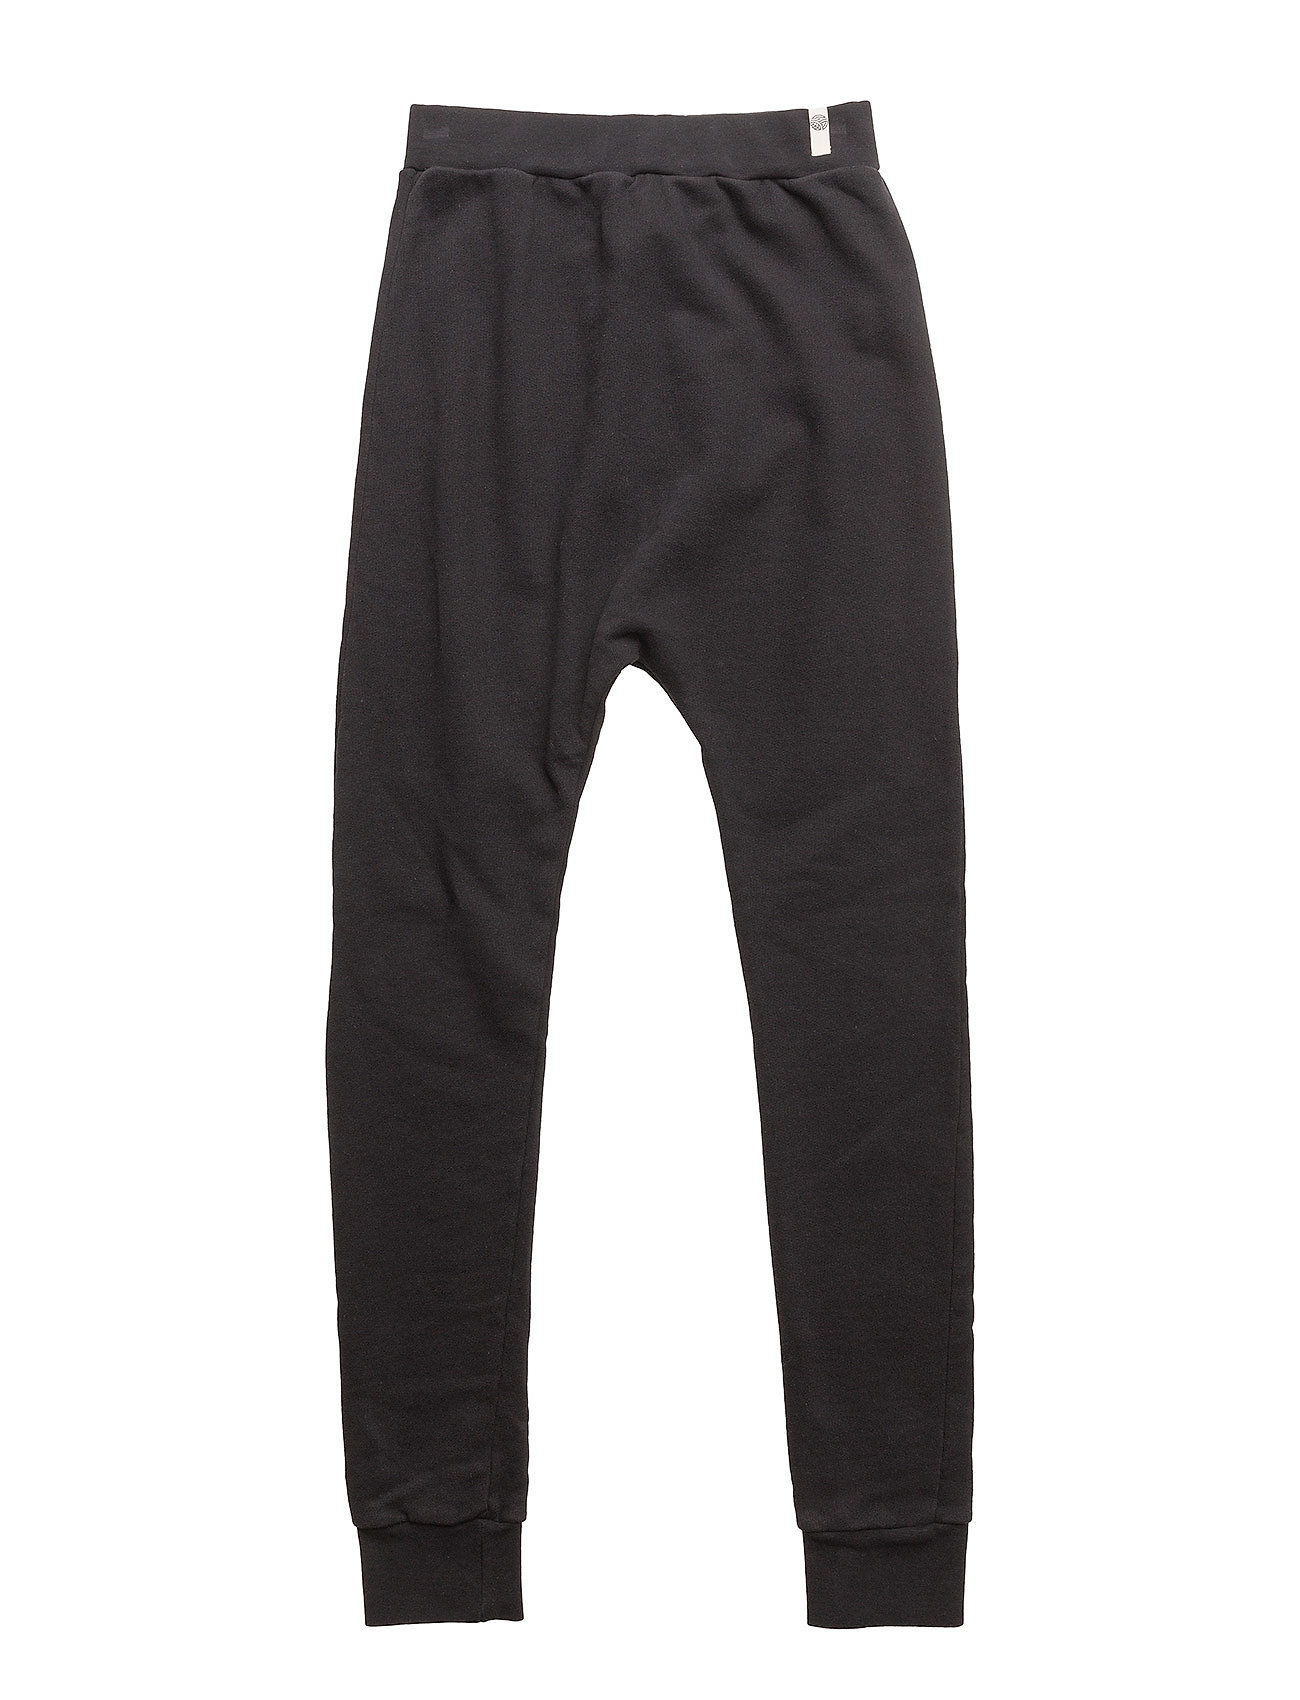 Image of Baggy Leggings Black (3001634327)